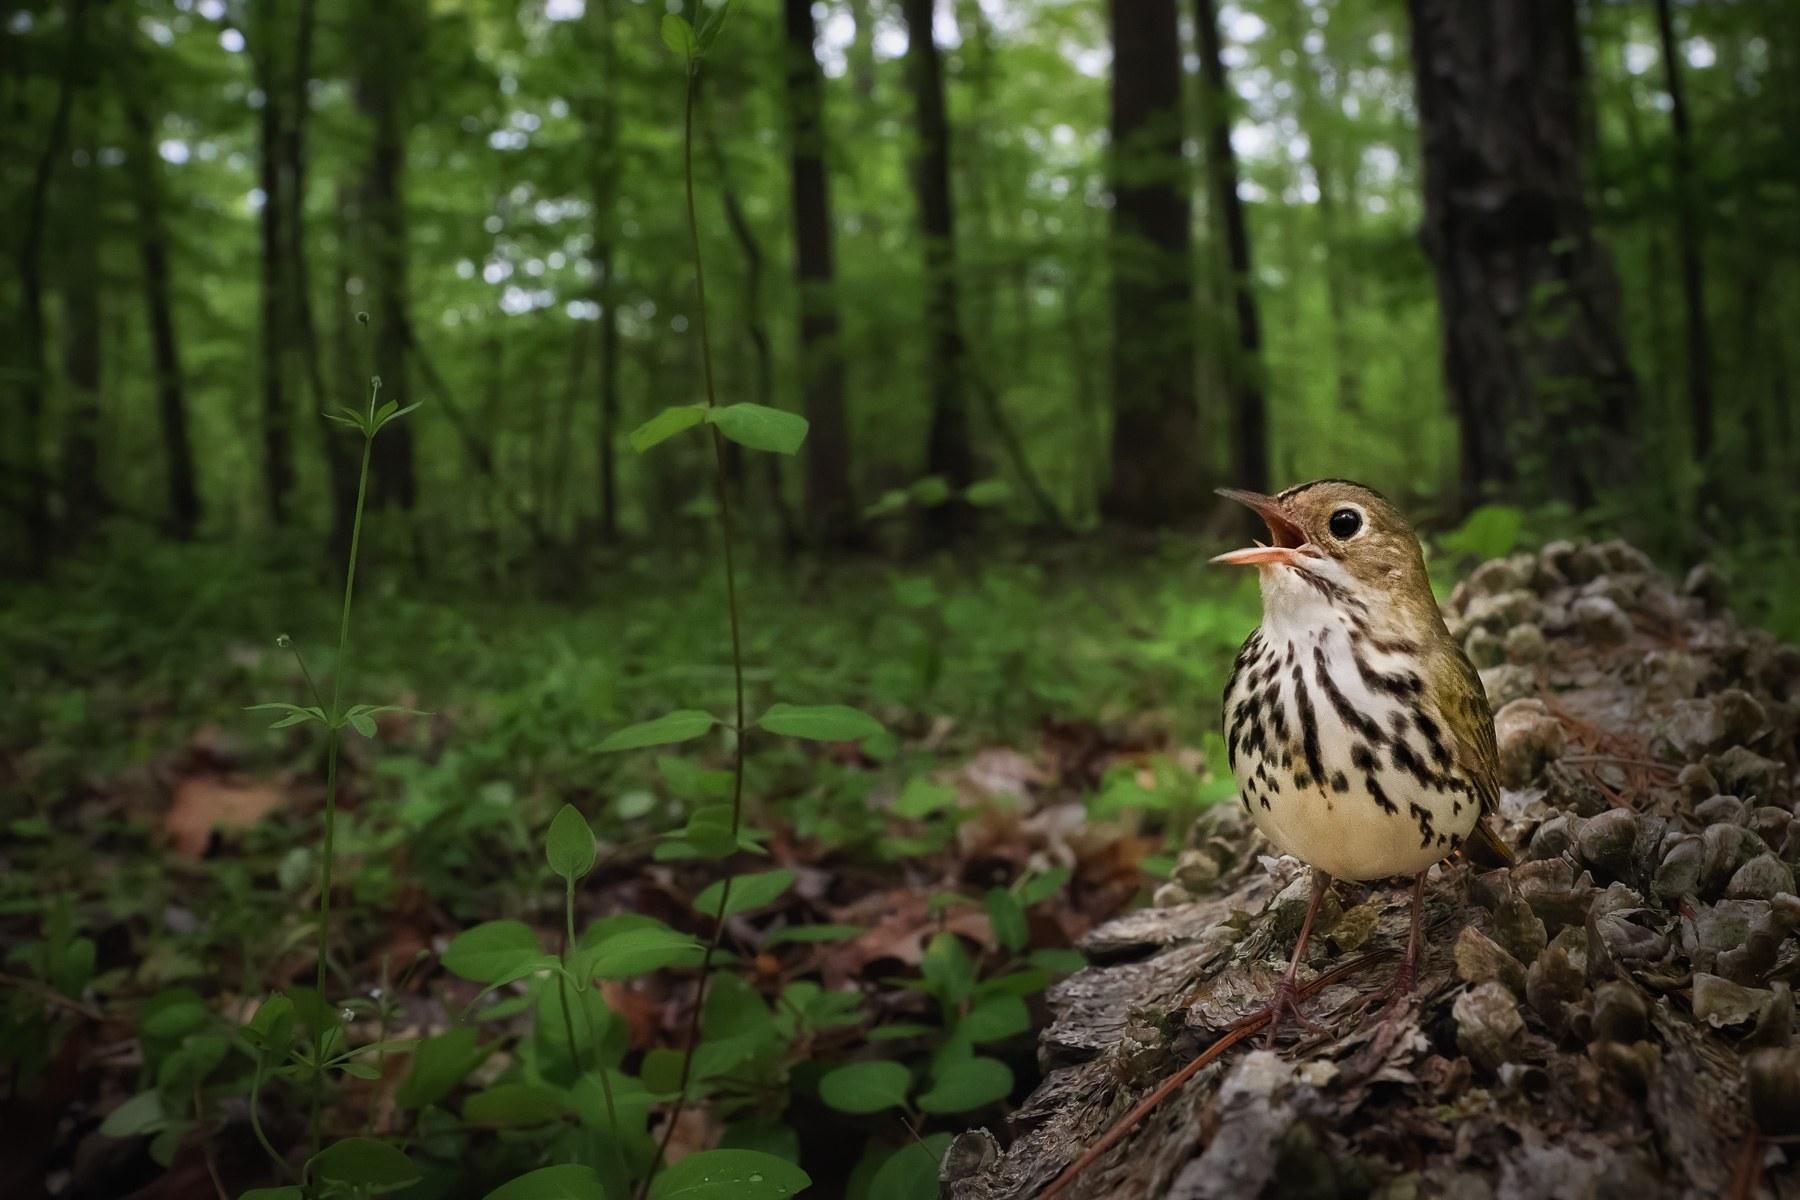 Silver winner: Birds in the Environment